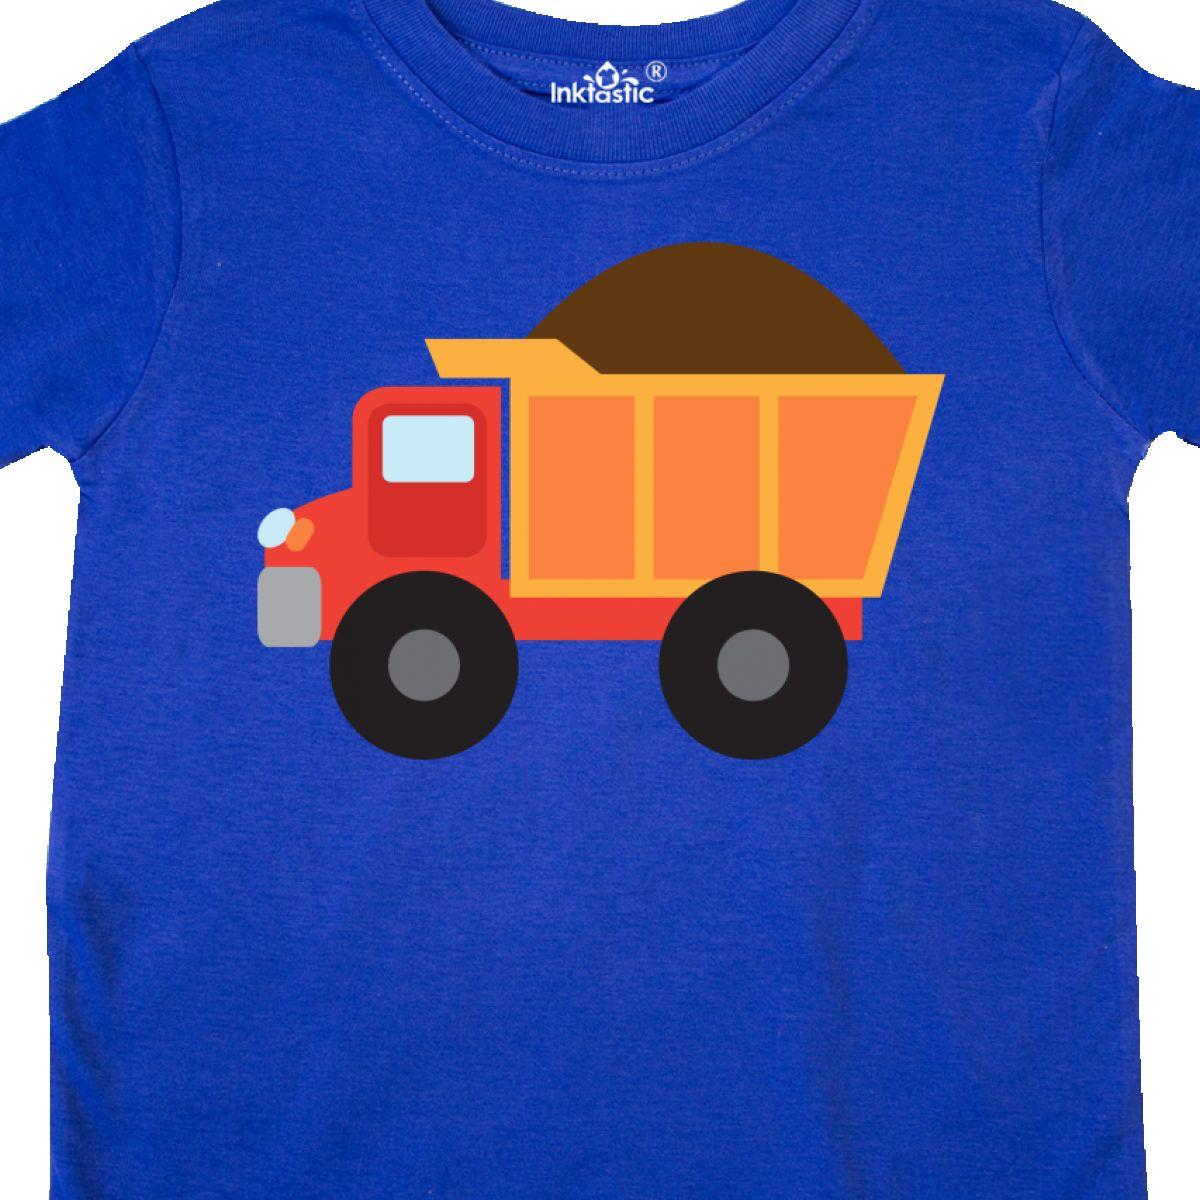 Inktastic-Work-Truck-Construction-Vehicle-Toddler-T-Shirt-Trucks-Vehicles-Cute thumbnail 34